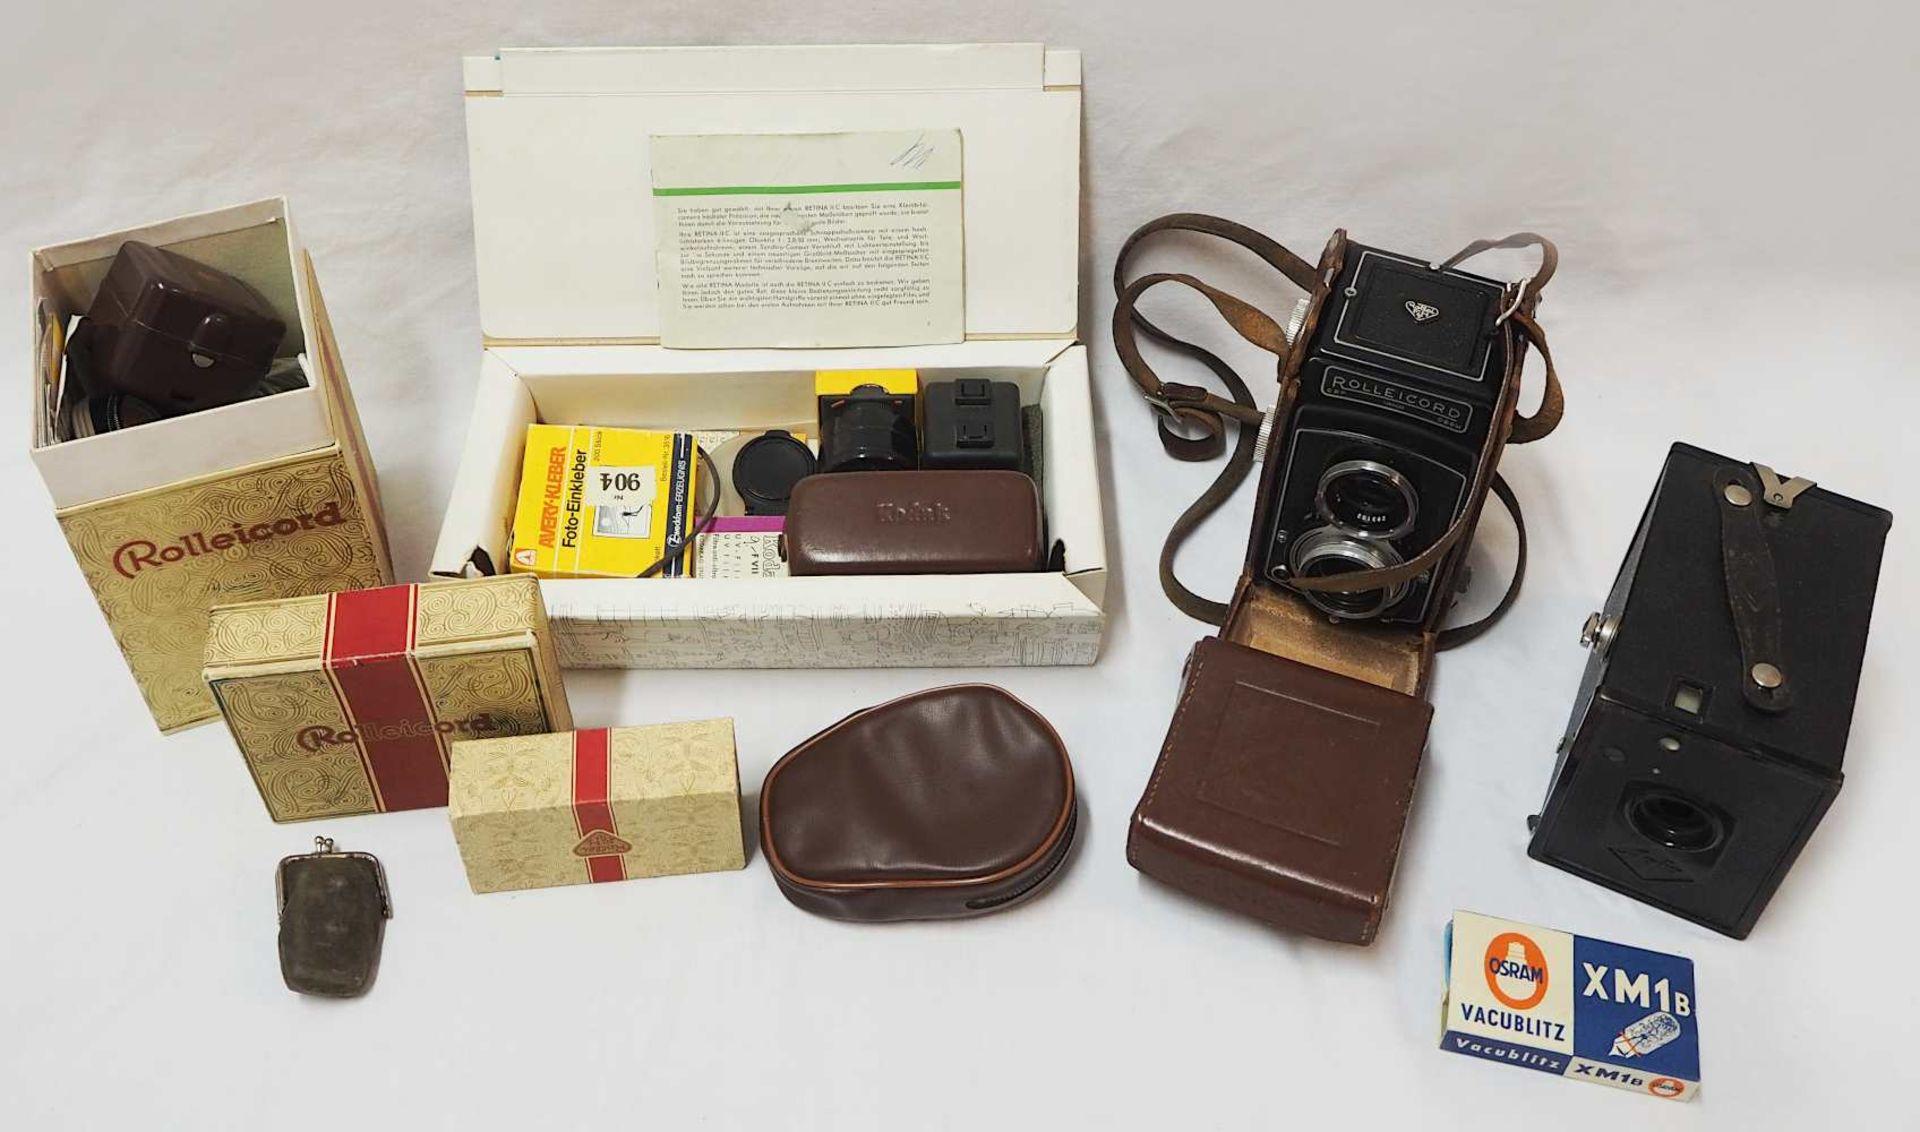 1 Fotoapparat ROLLEICORD Modellnr. 1369420, wohl 1950er Jahre mit Doppelobjektiv FRANK